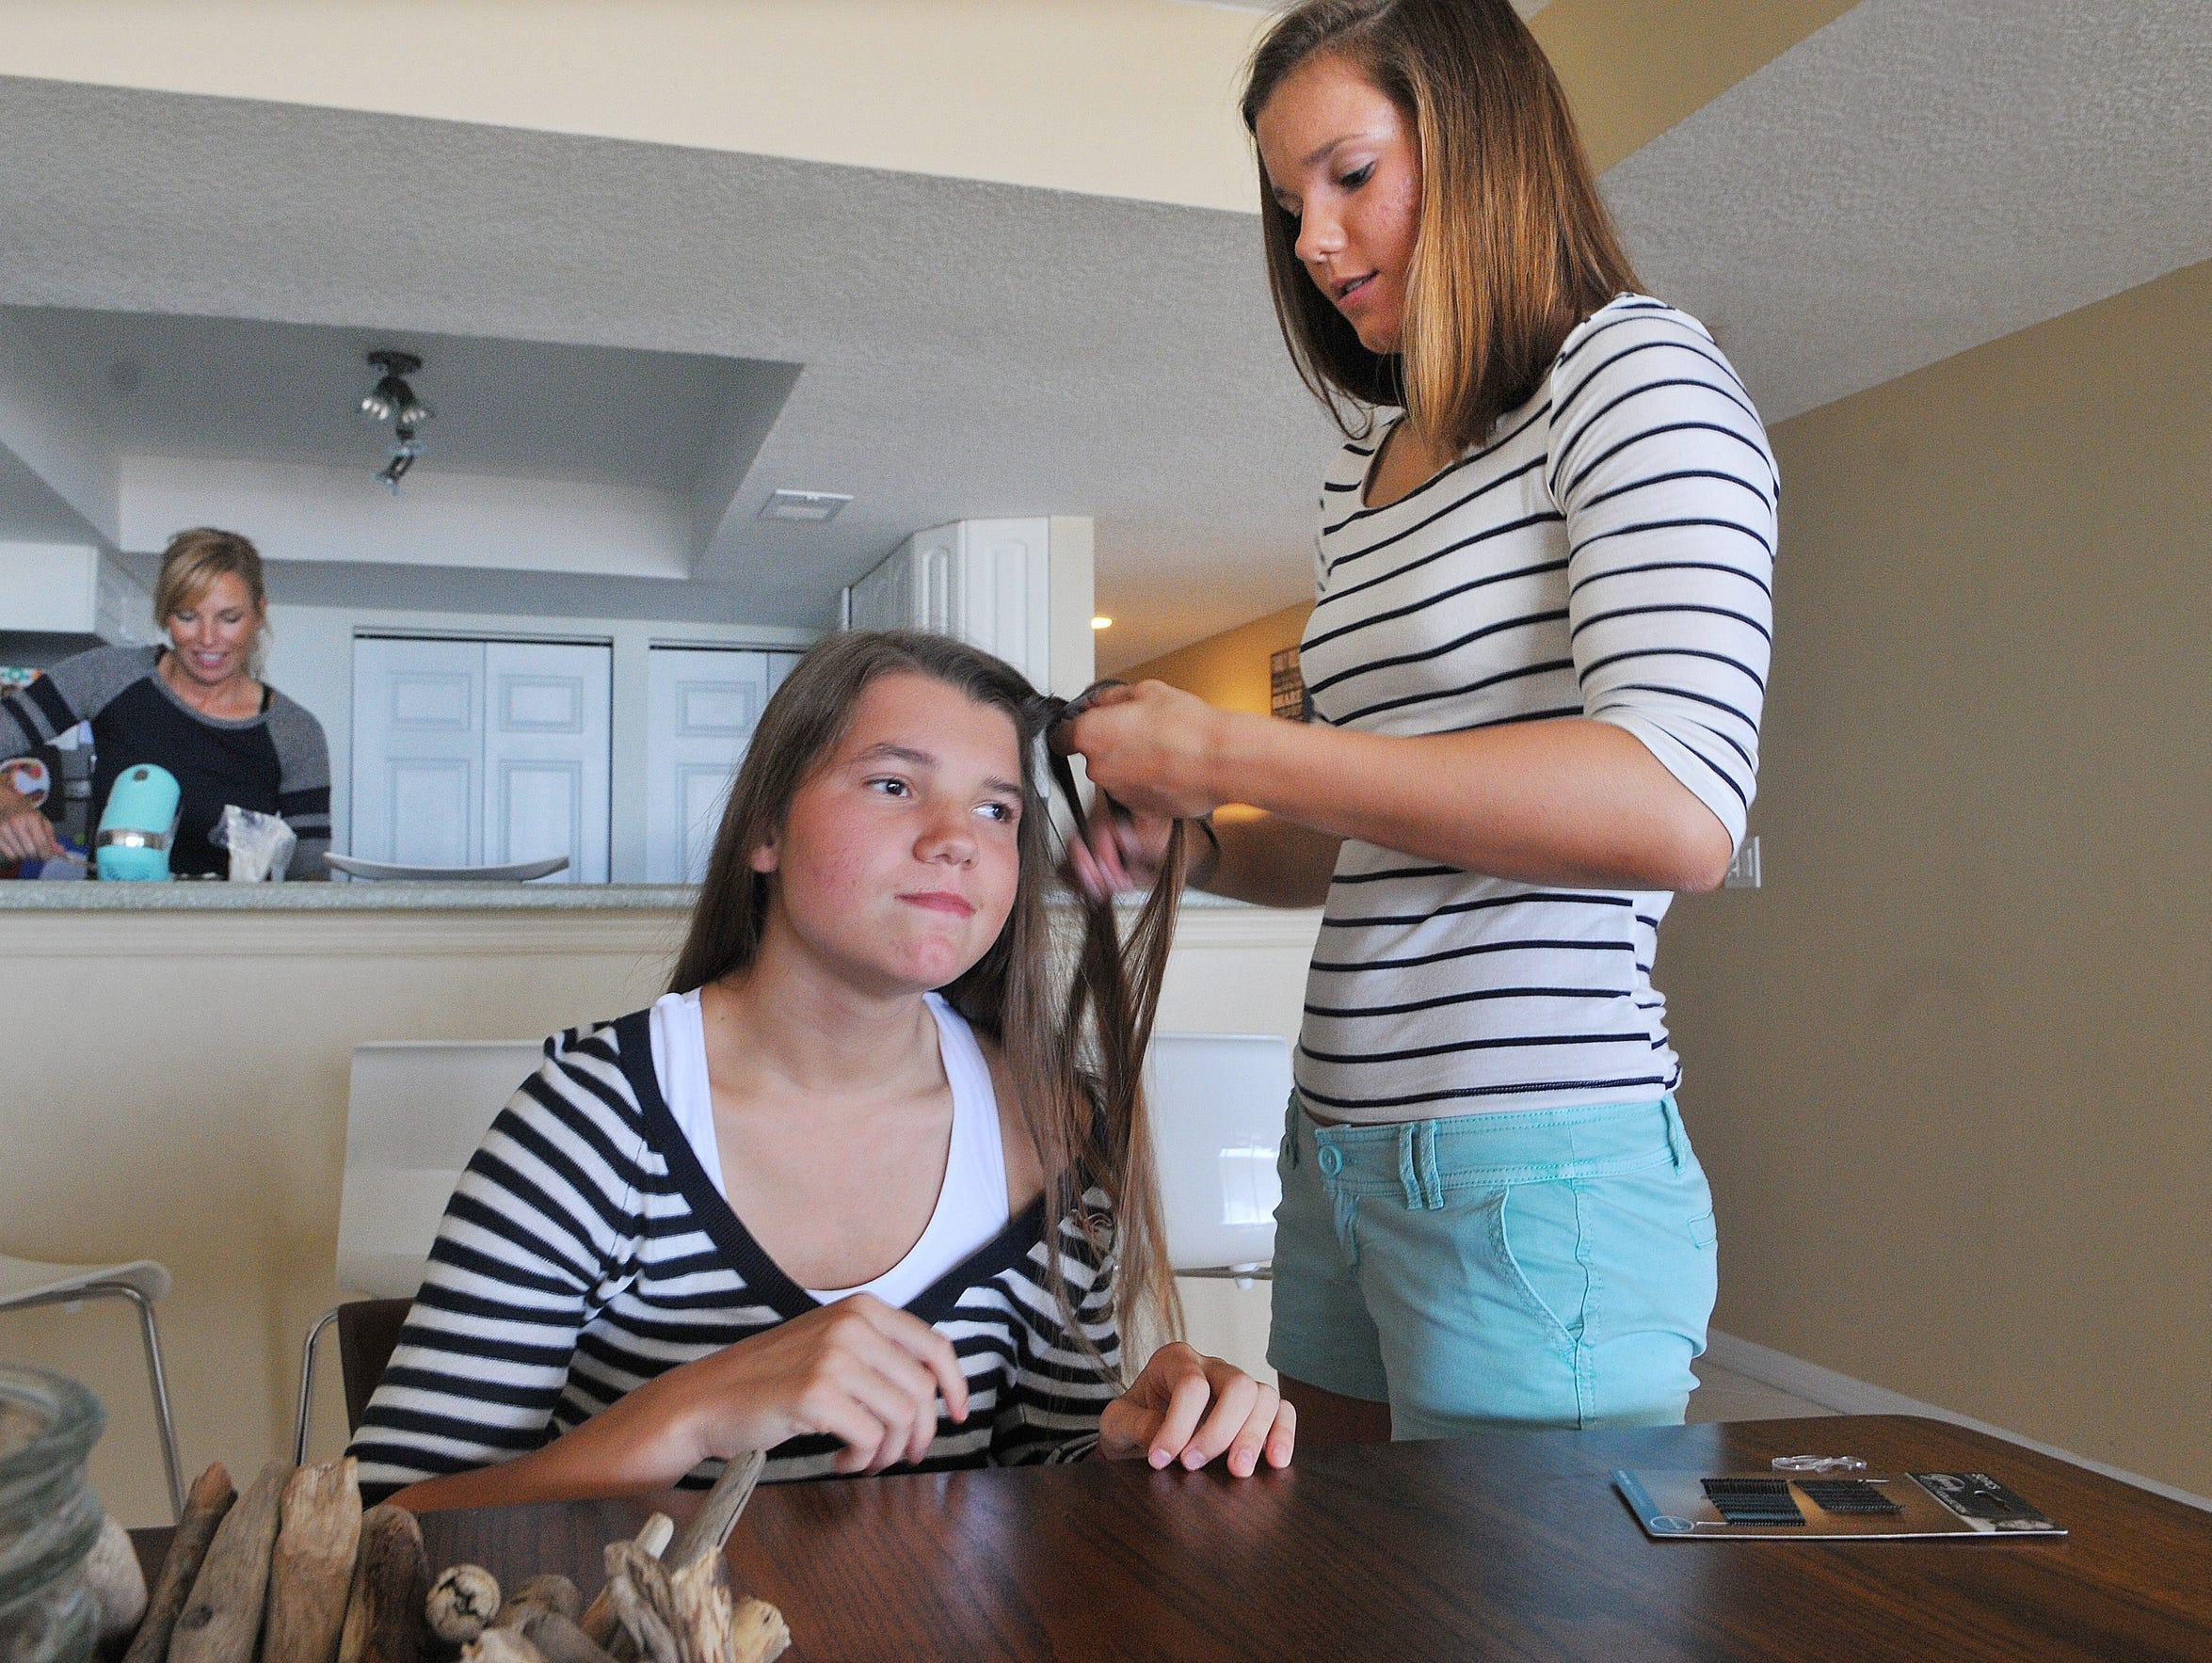 Adrianna helps braid Olivia's hair.